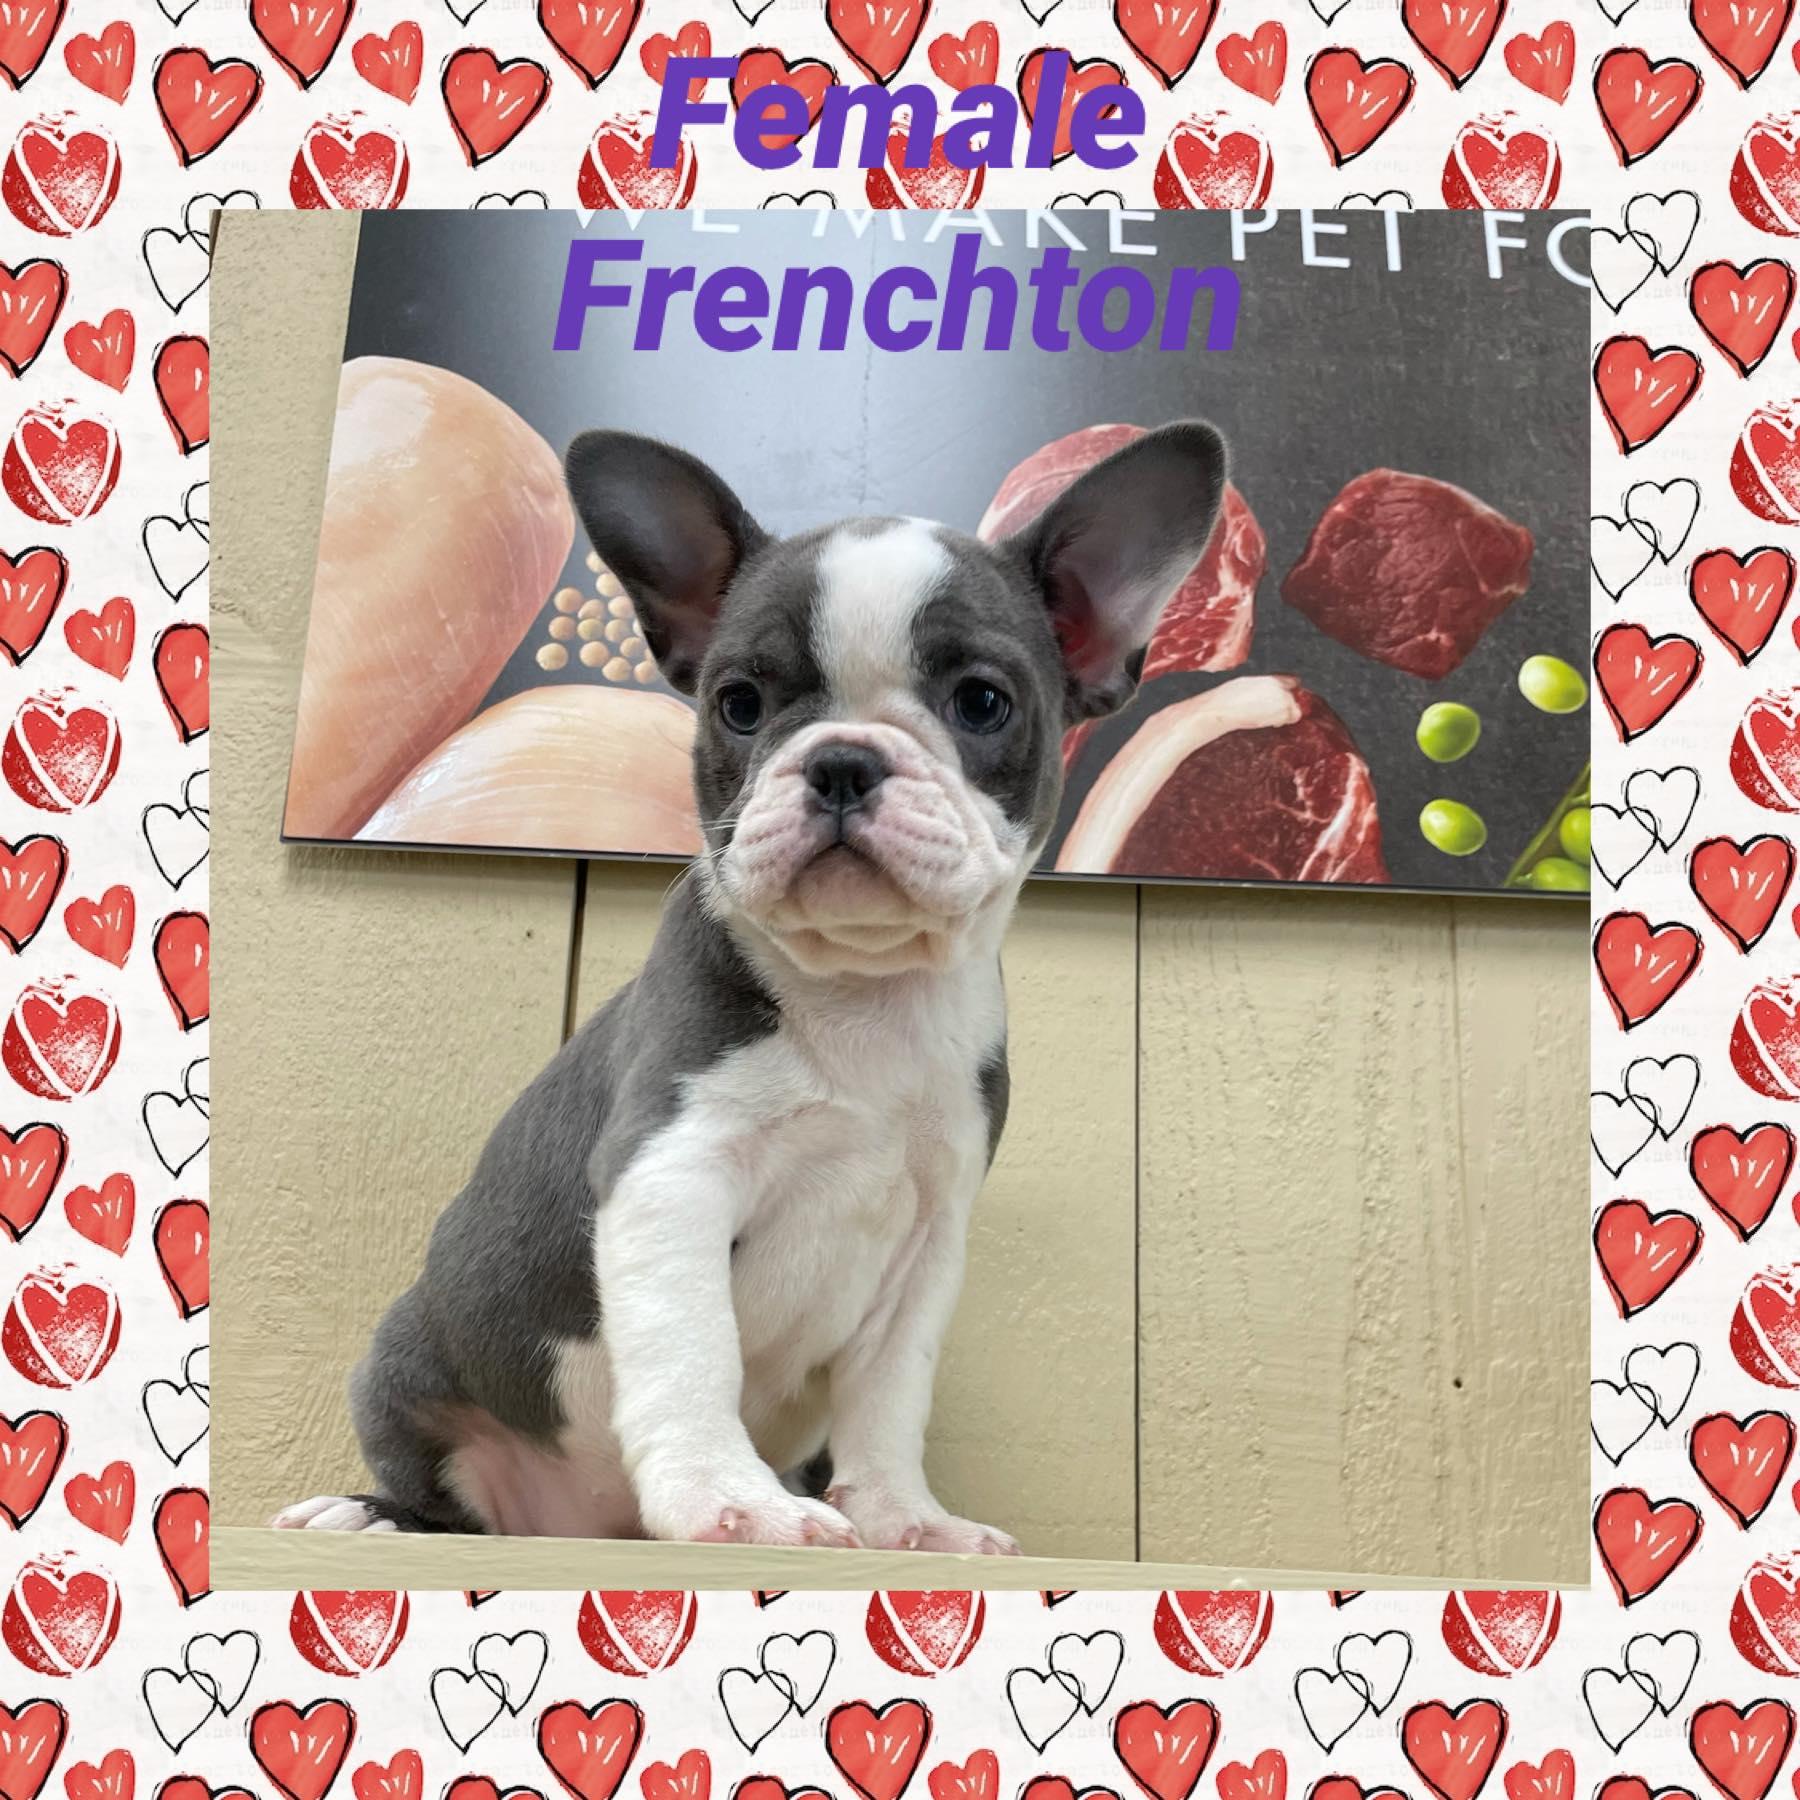 FRENCHTON